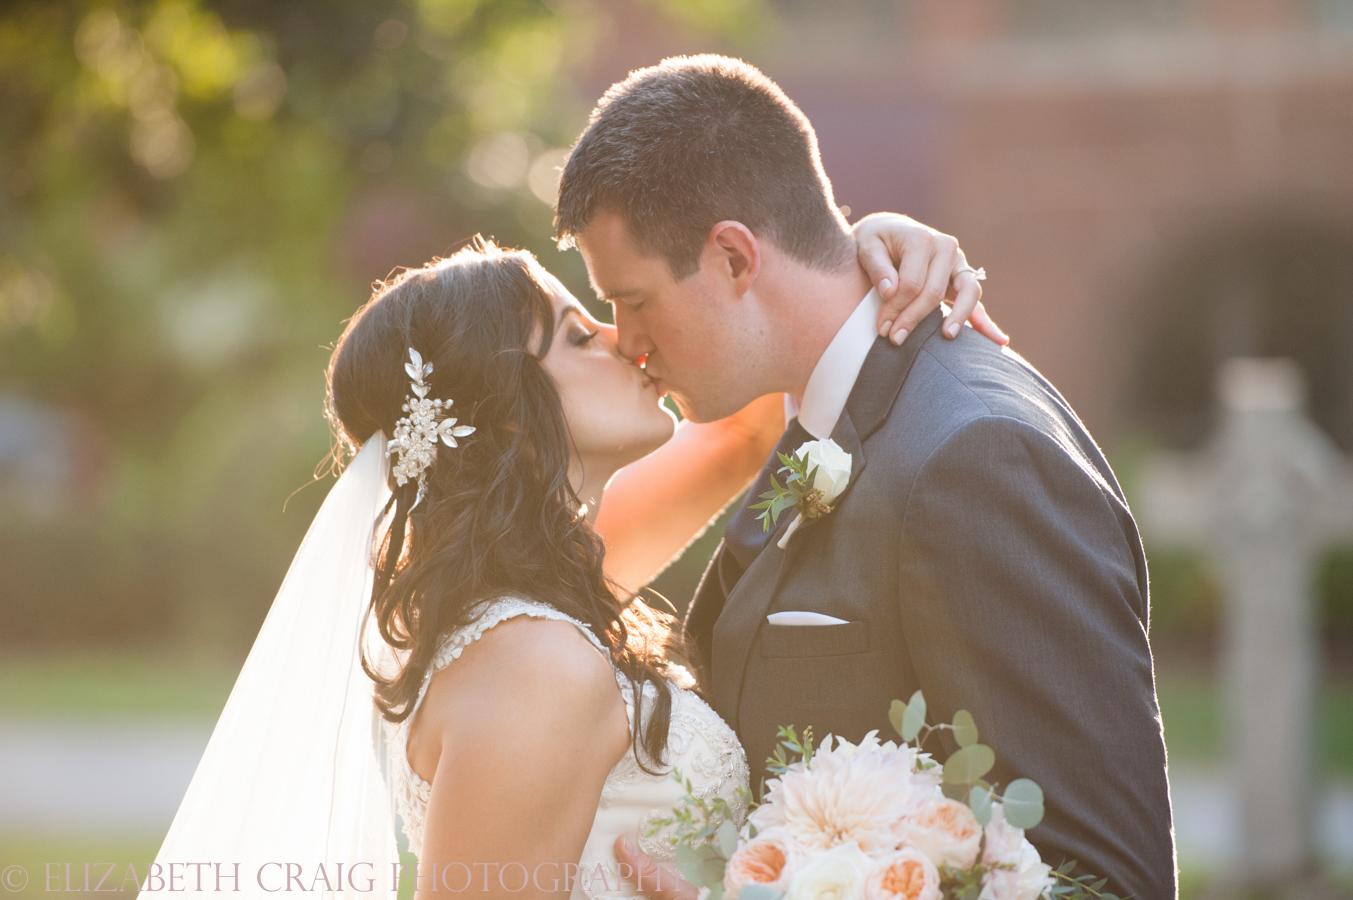 pittsburgh-greek-weddings-fairmont-weddings-receptions-elizabeth-craig-photohgraphy-015